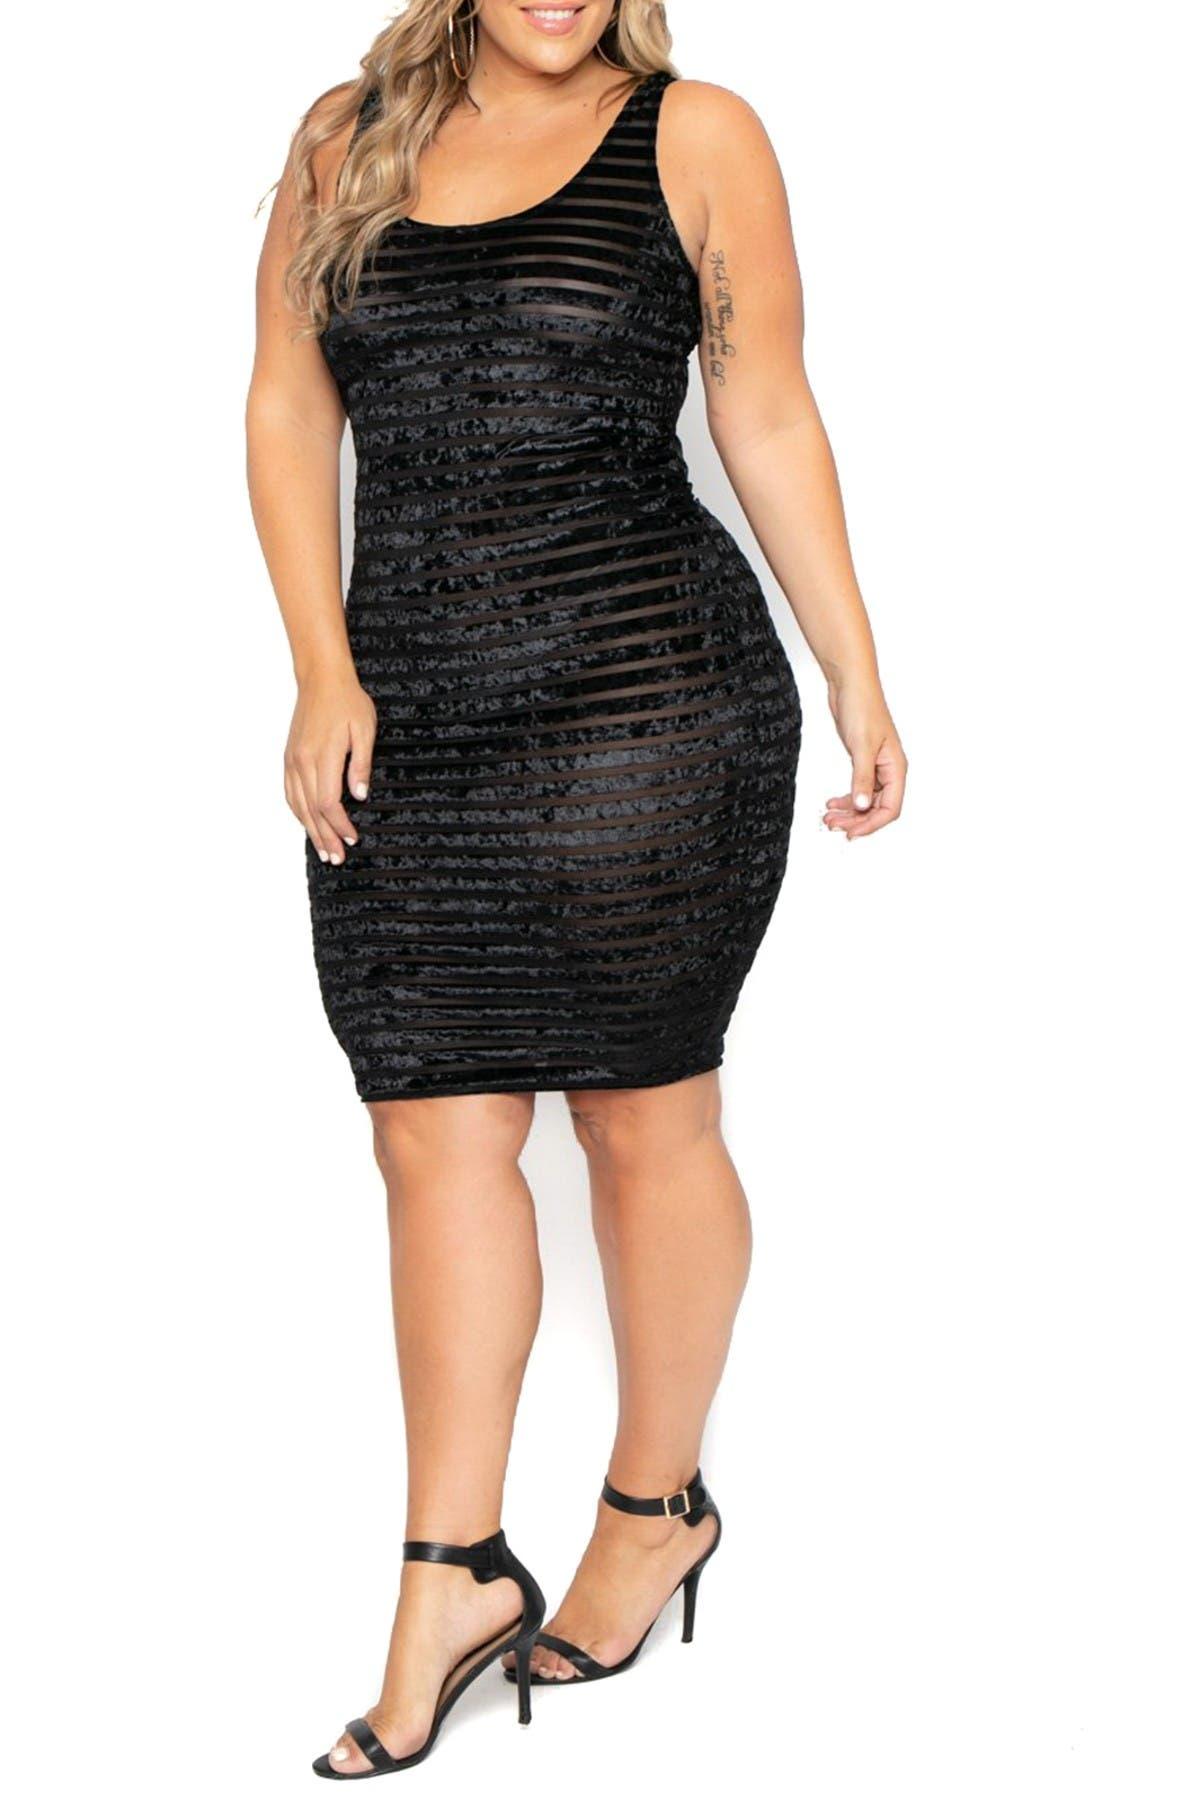 Curvy Sense Crushed Velvet Striped Mesh Dress